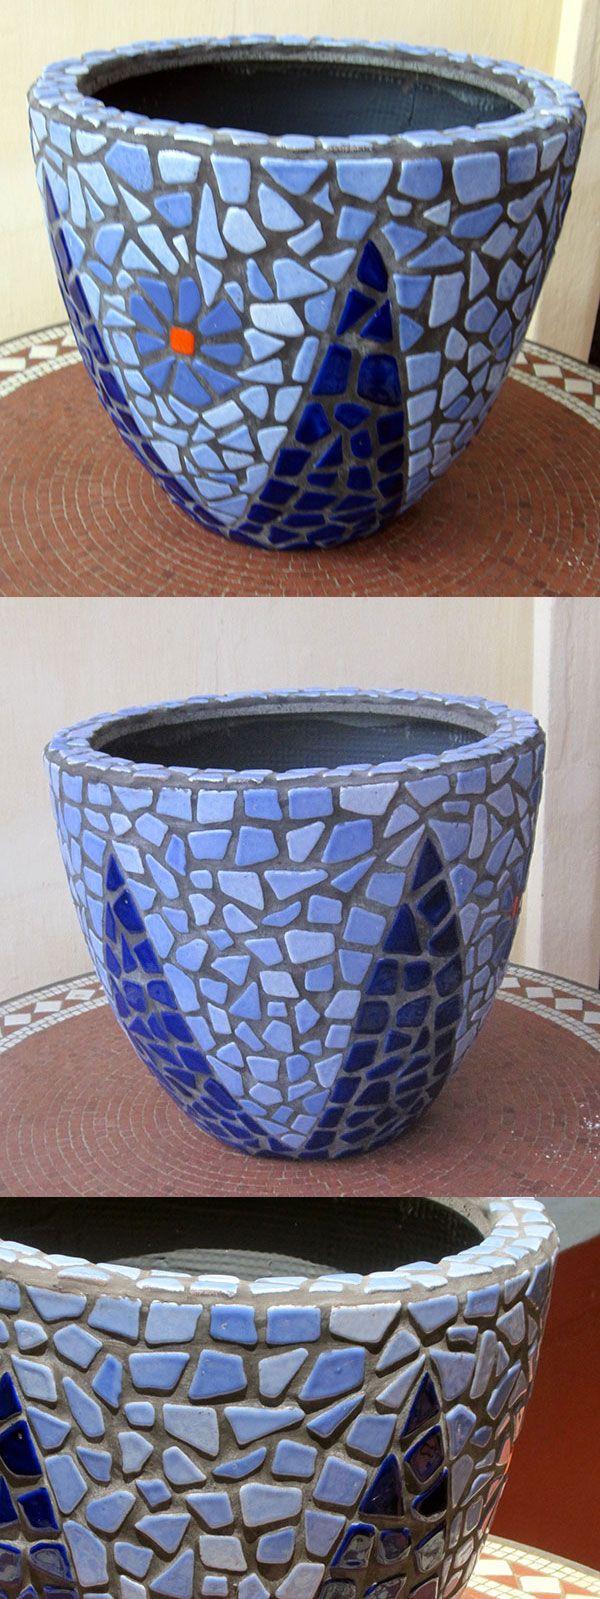 Diy mosaic blue flower pot mosaik blumentopf mosaique pot de diy mosaic blue flower pot mosaik blumentopf mosaique pot de fleur broken ceramic dailygadgetfo Image collections